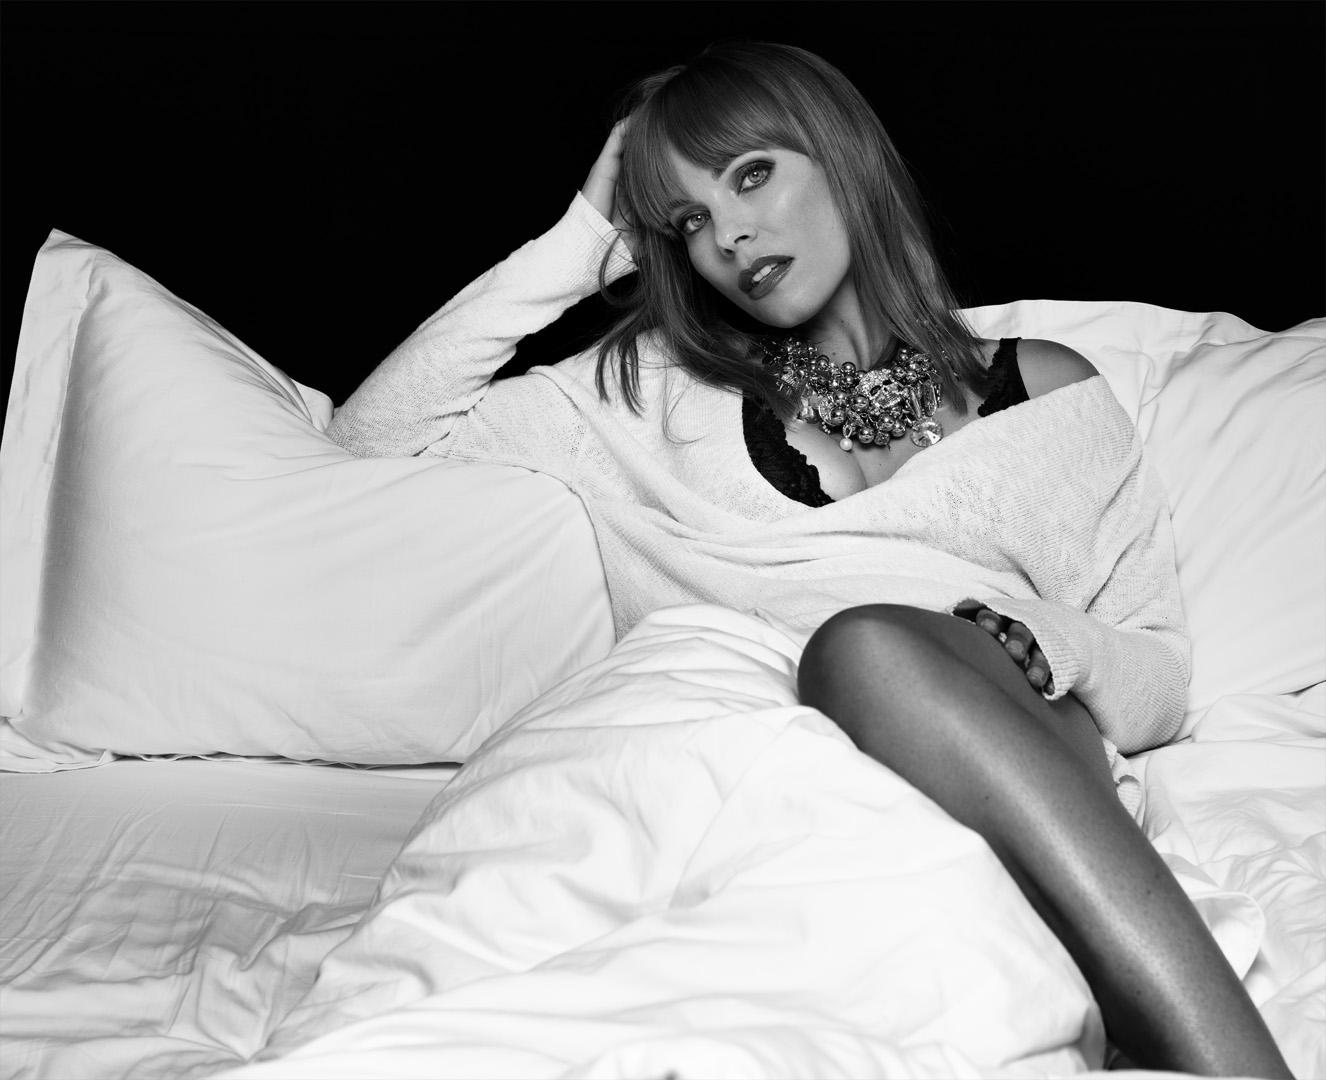 Model Ingvill posing on the bed